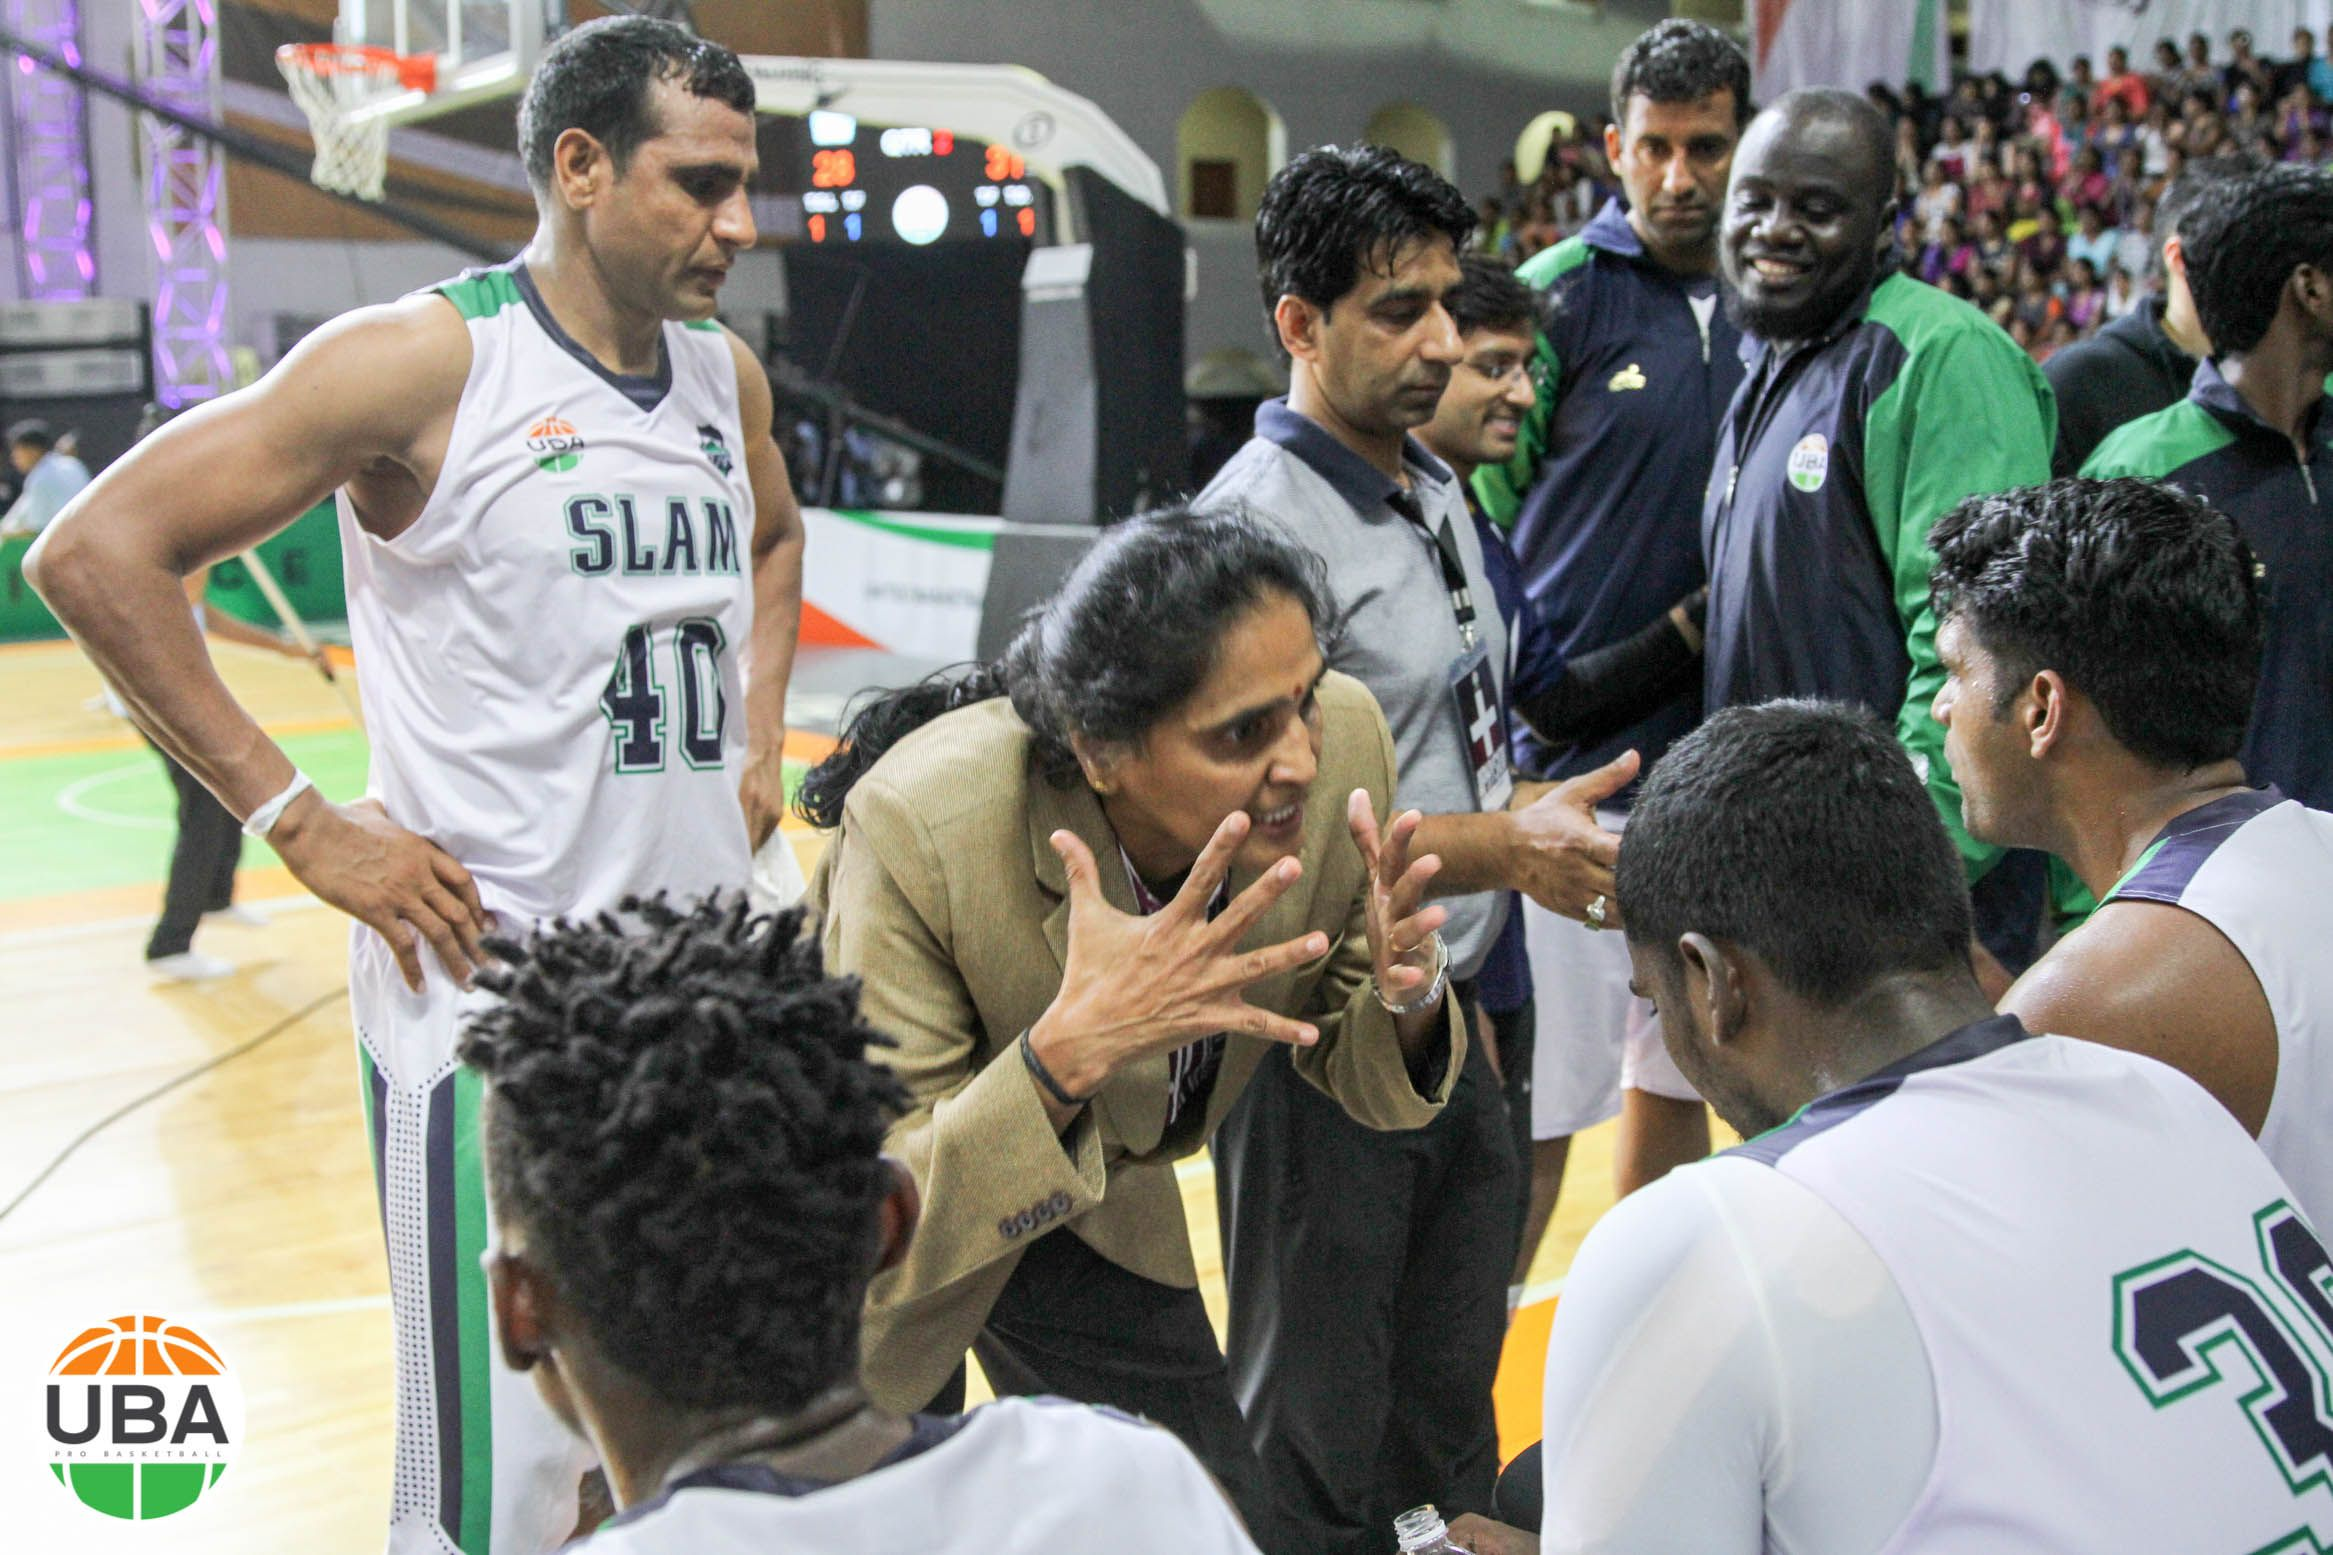 Chennai Slam S Legendary Coach Prasanna Jayasankar Is One Of India S Most Decorated Basketball Players Ubaindia Basketball Players Slammed Basketball Teams